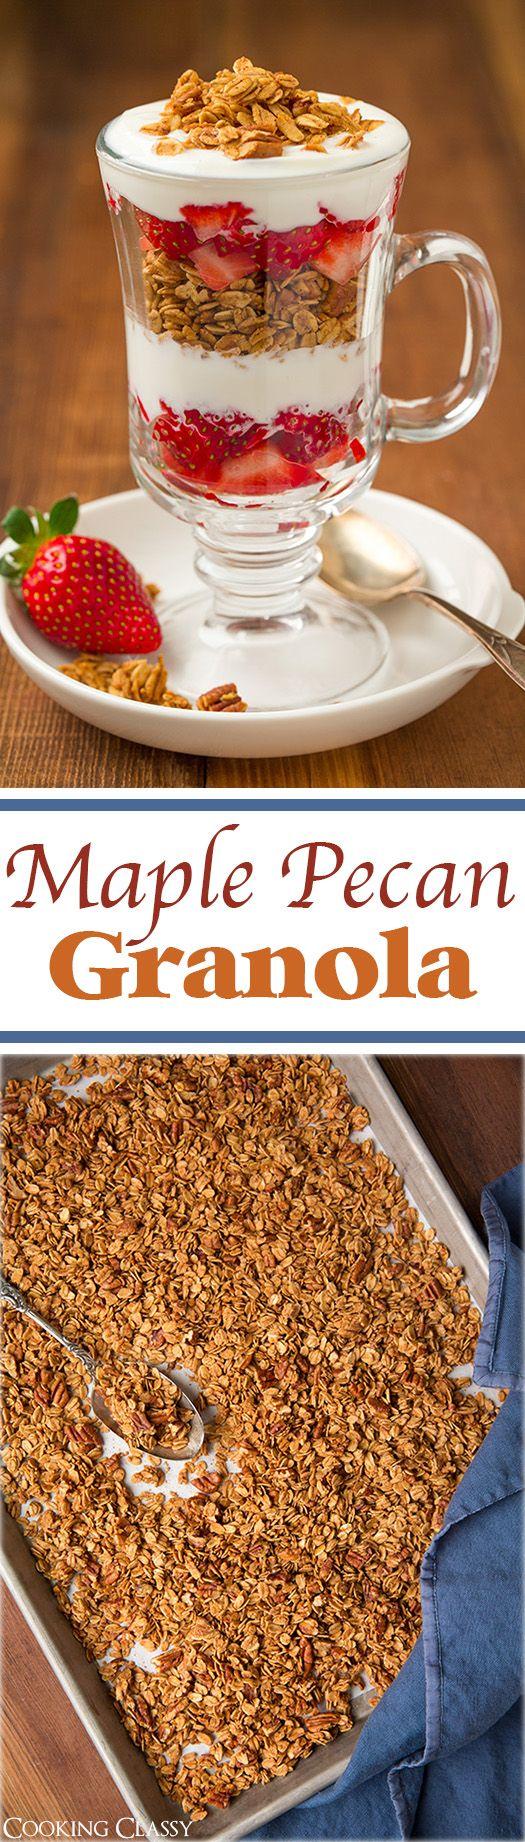 1000+ images about Yogurt and granola on Pinterest ...